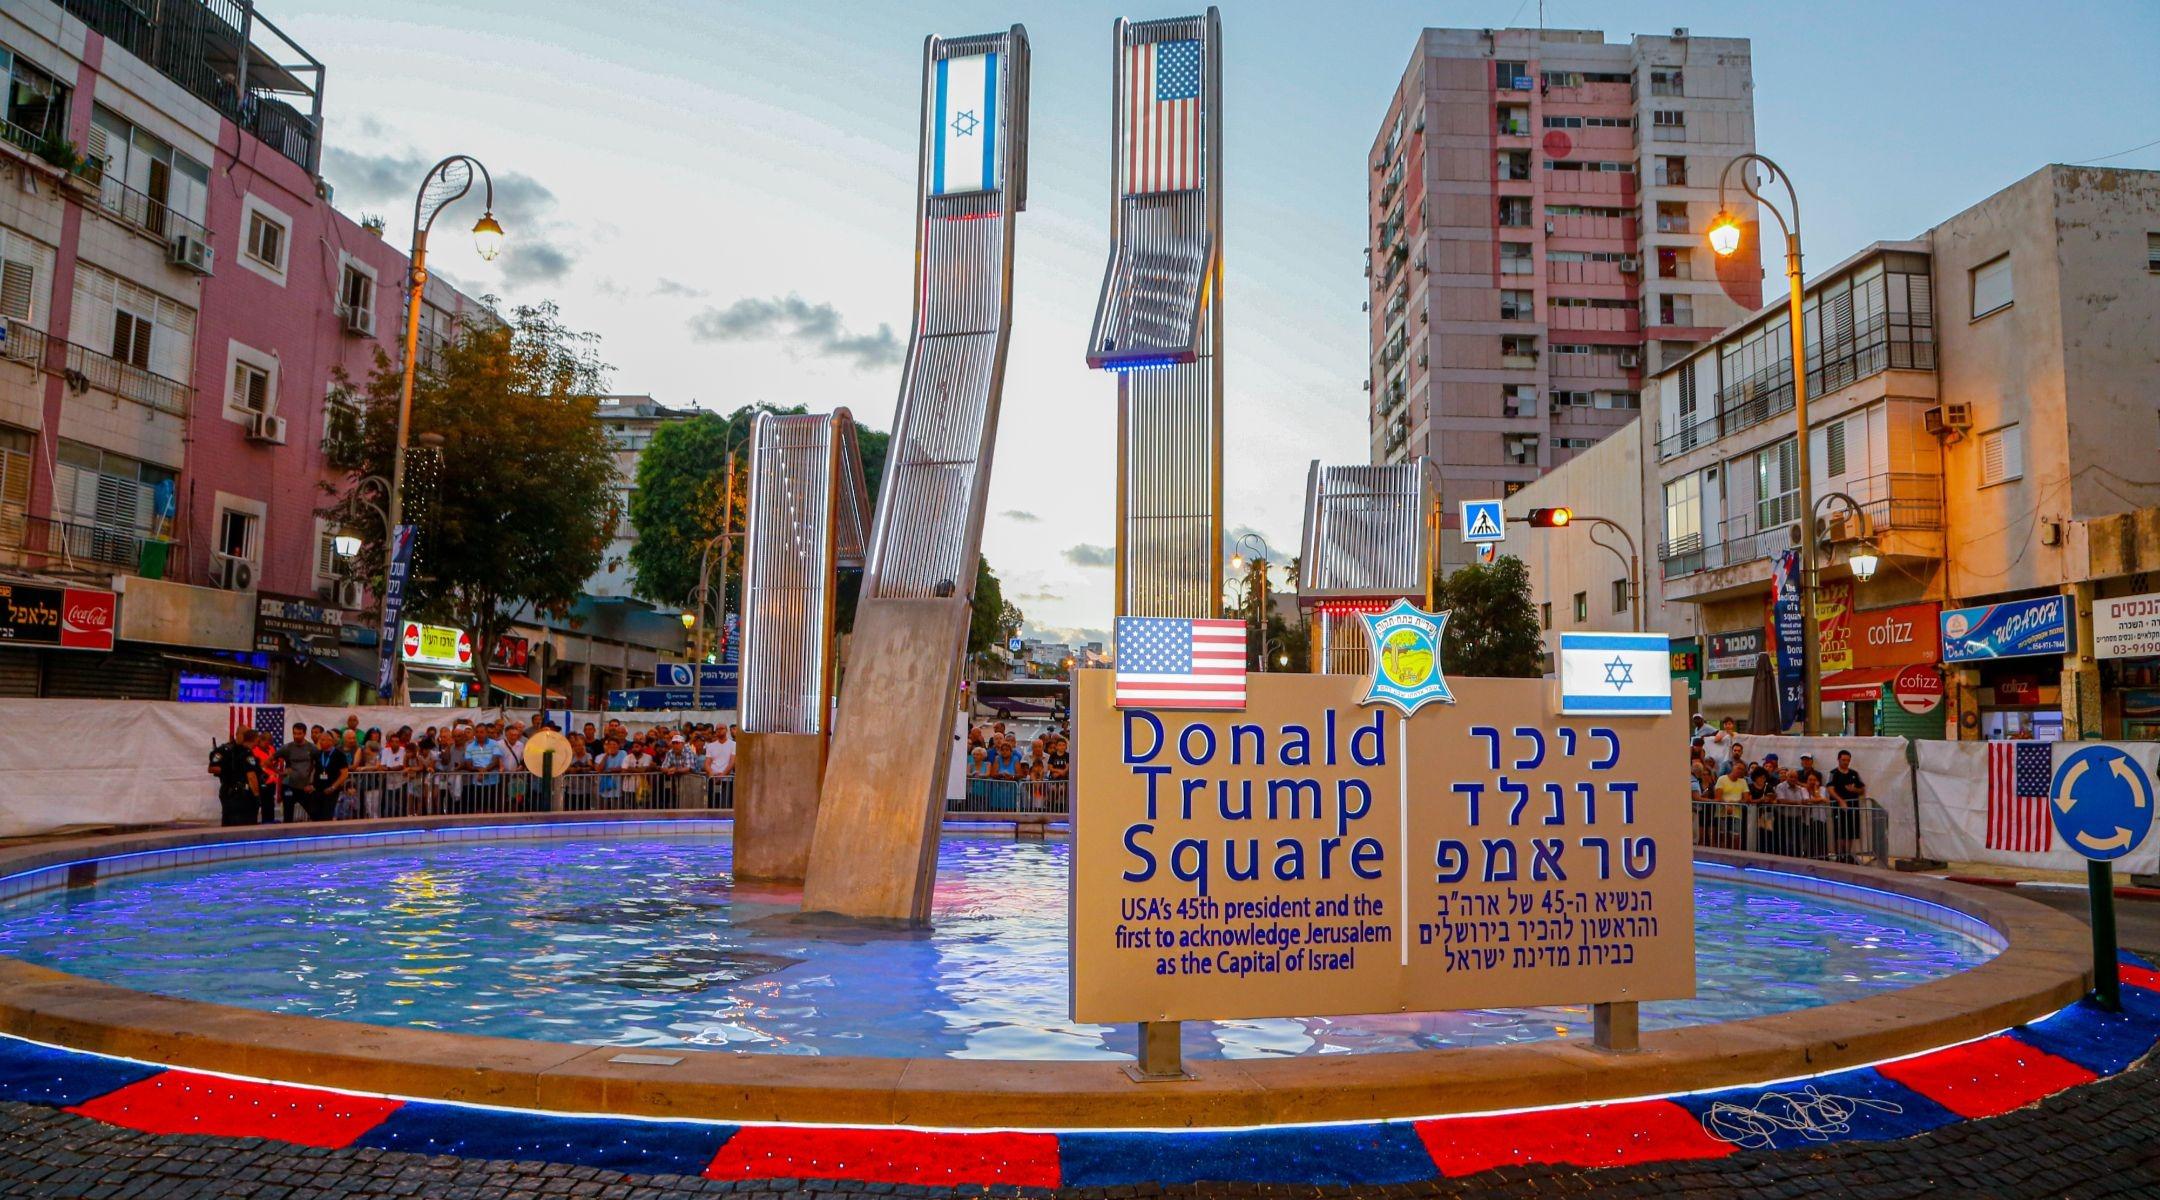 Suspect arrested in vandalism of Israel's Donald Trump Square